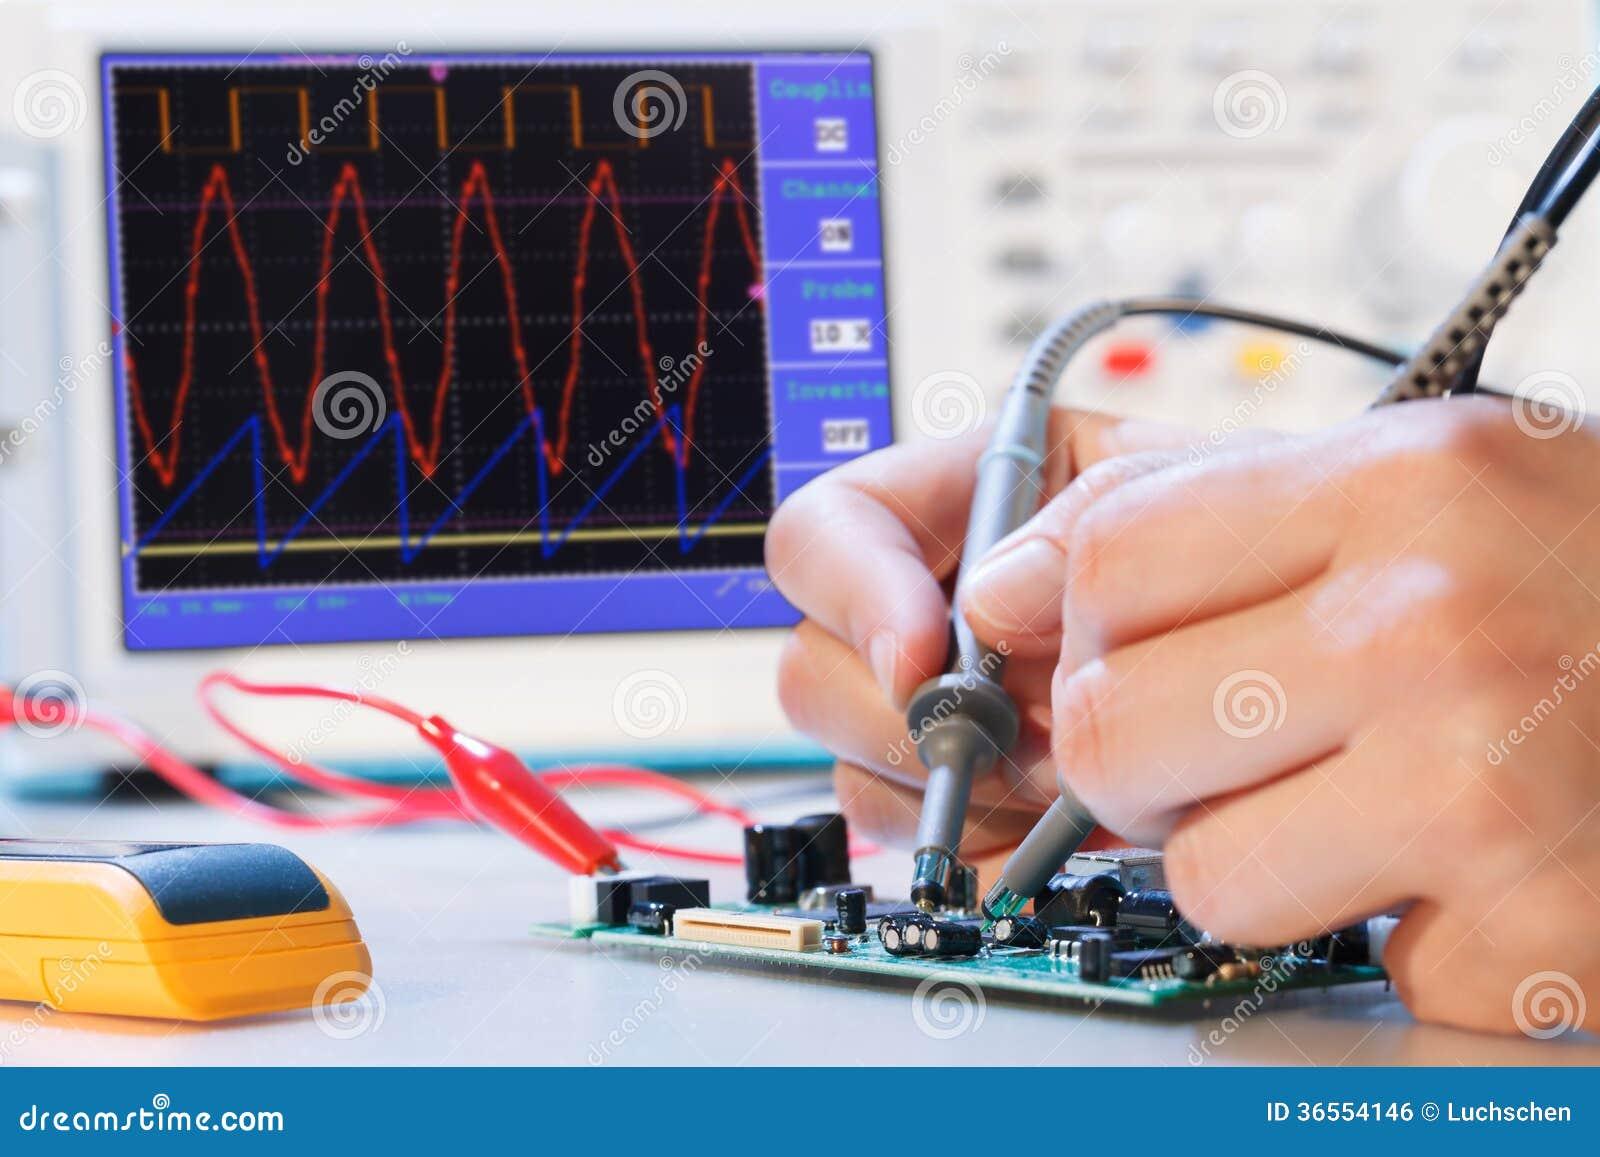 Development electronic micro processor